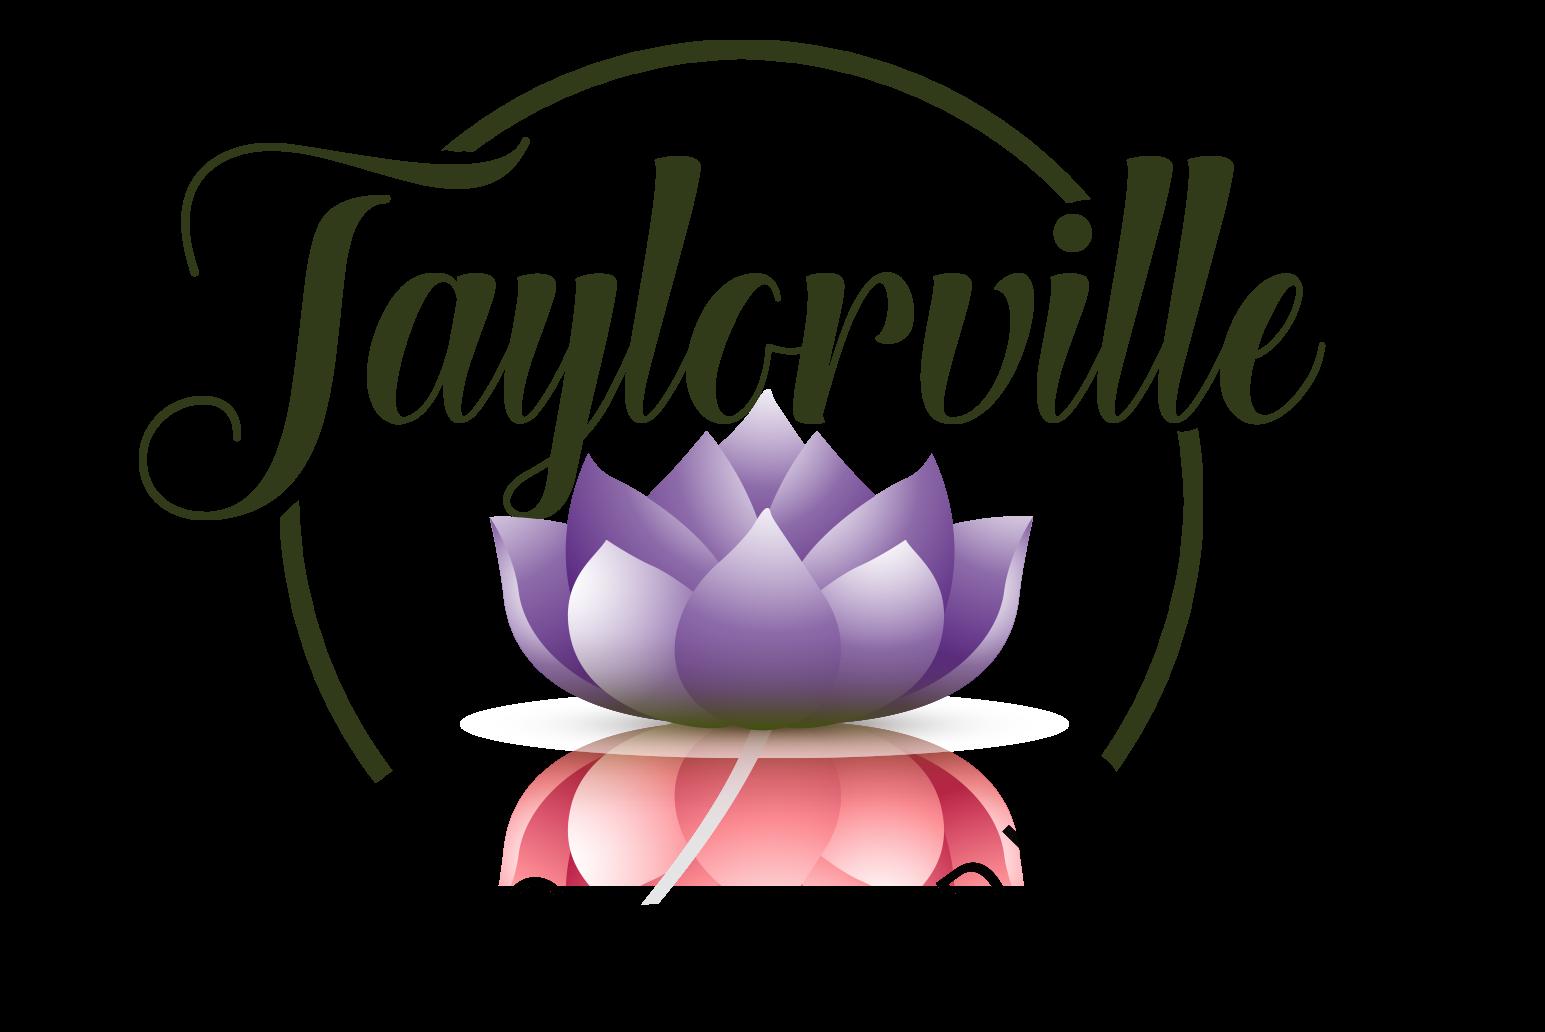 Taylorville Yoga Studio